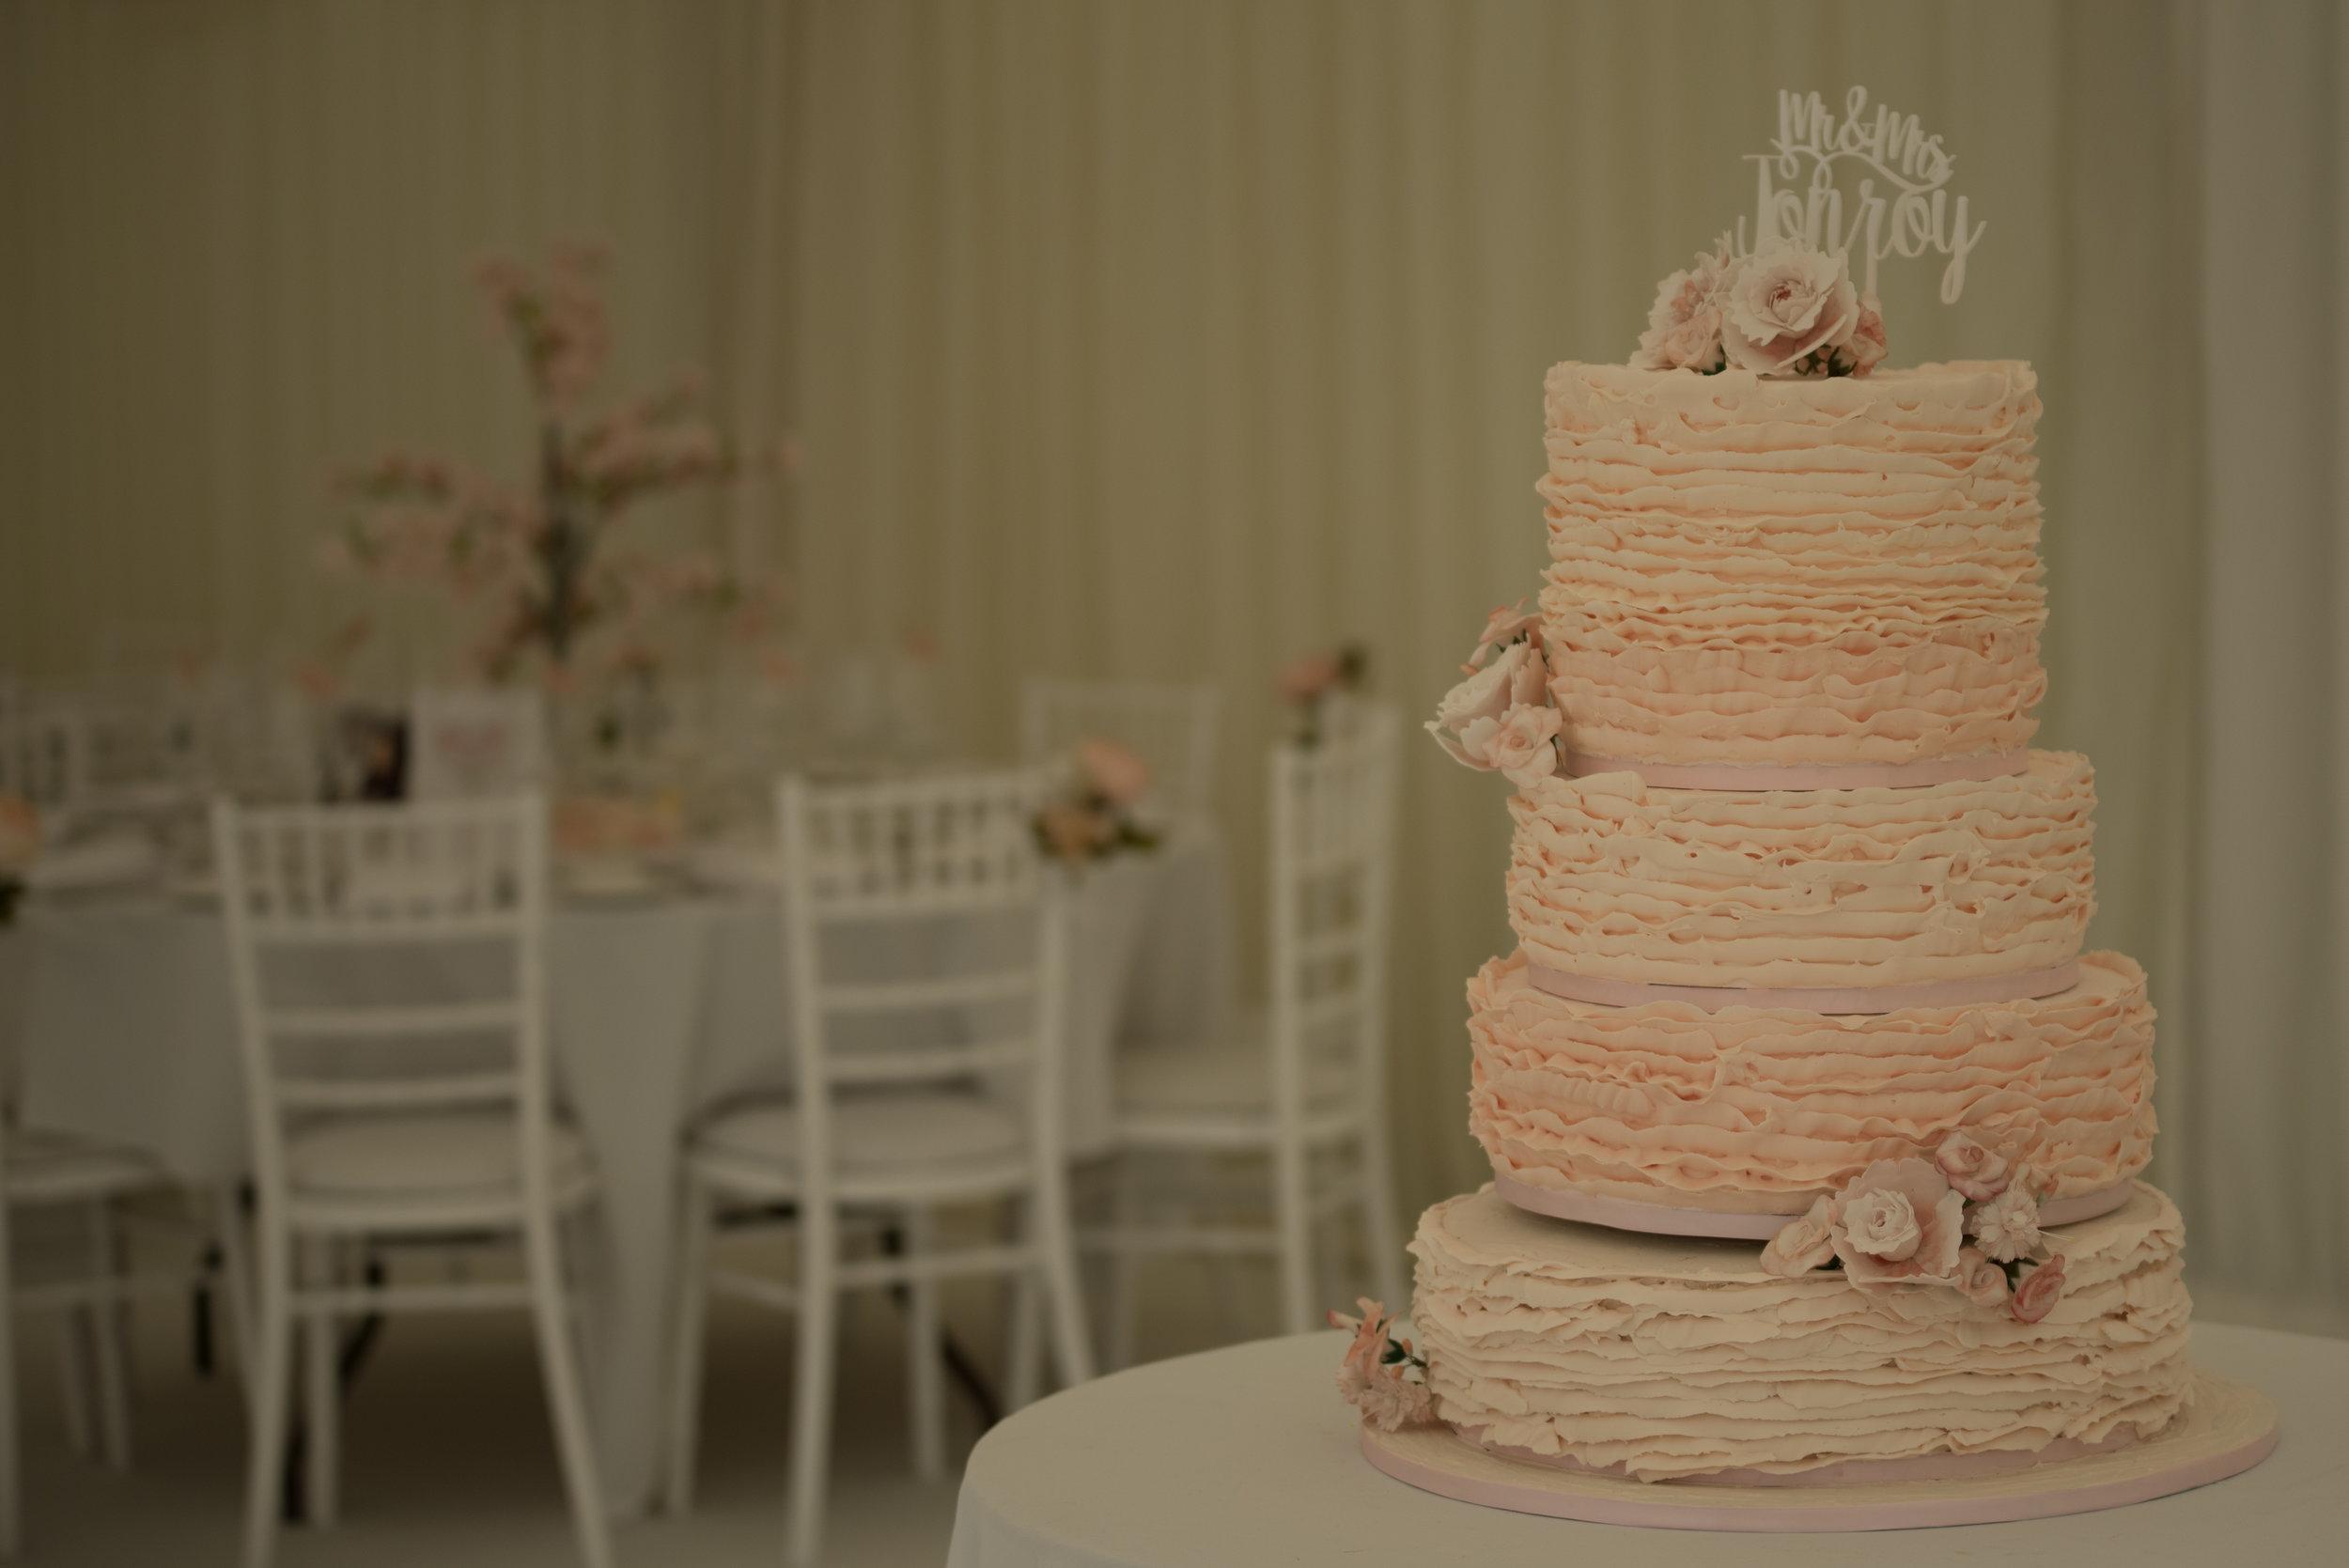 Danesfield House wedding, Danesfield House wedding photography, Danesfield House wedding photography, marquee wedding photography, marquee wedding Buckinghamshire, Canny Cake Company, wedding cake